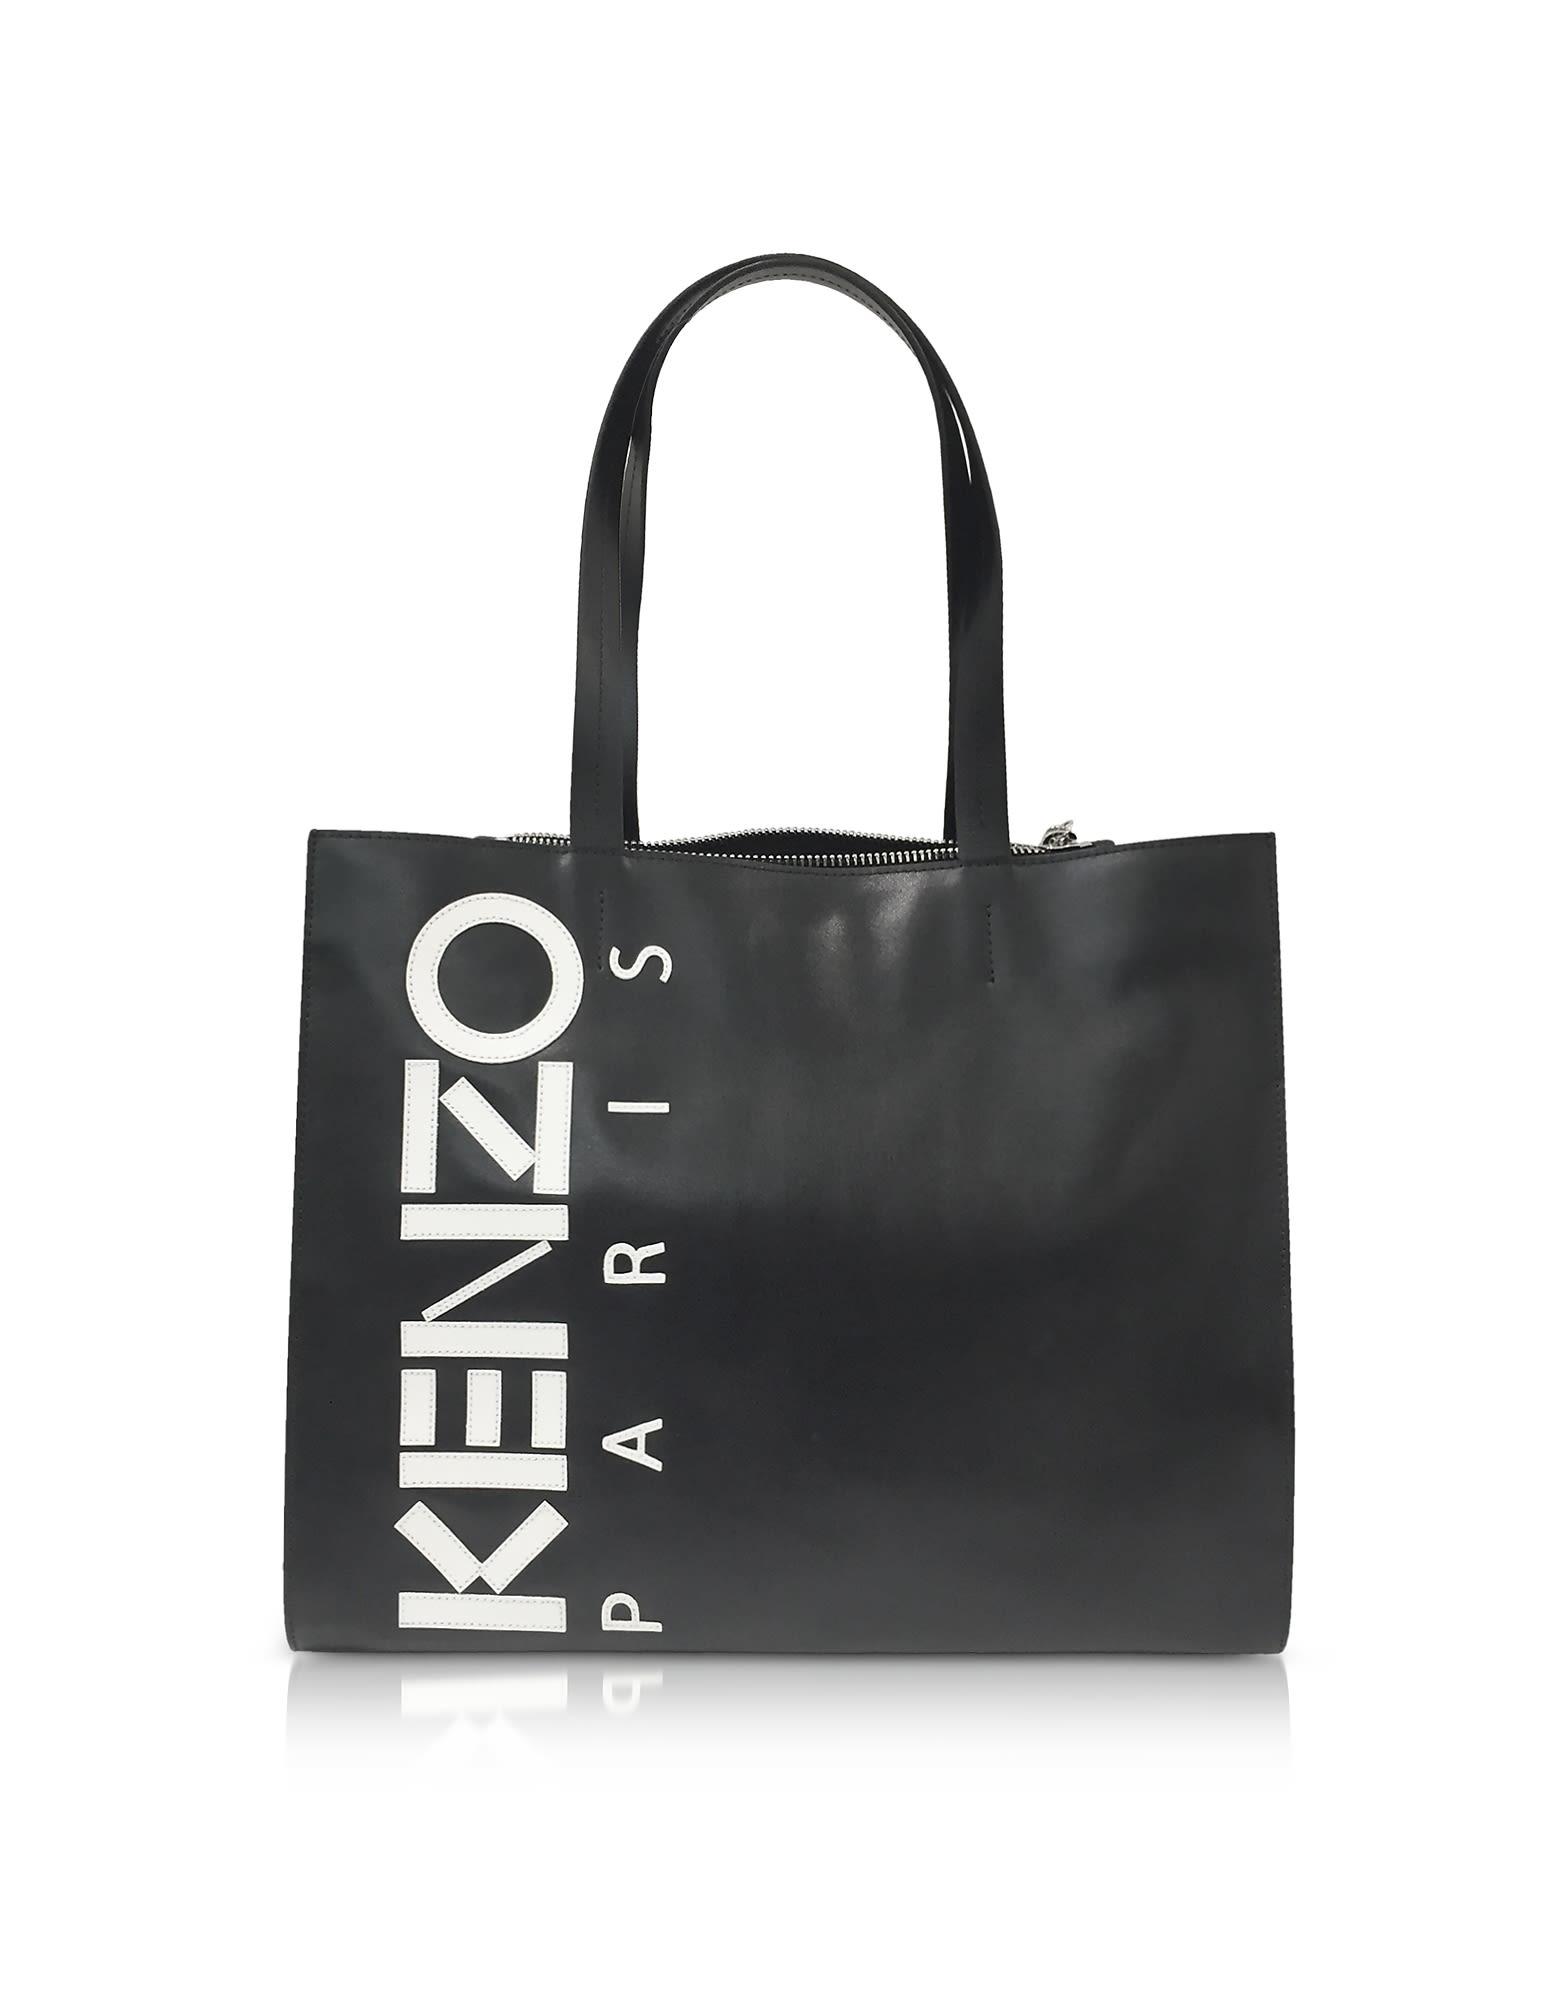 KENZO Logo Print Tote, Black